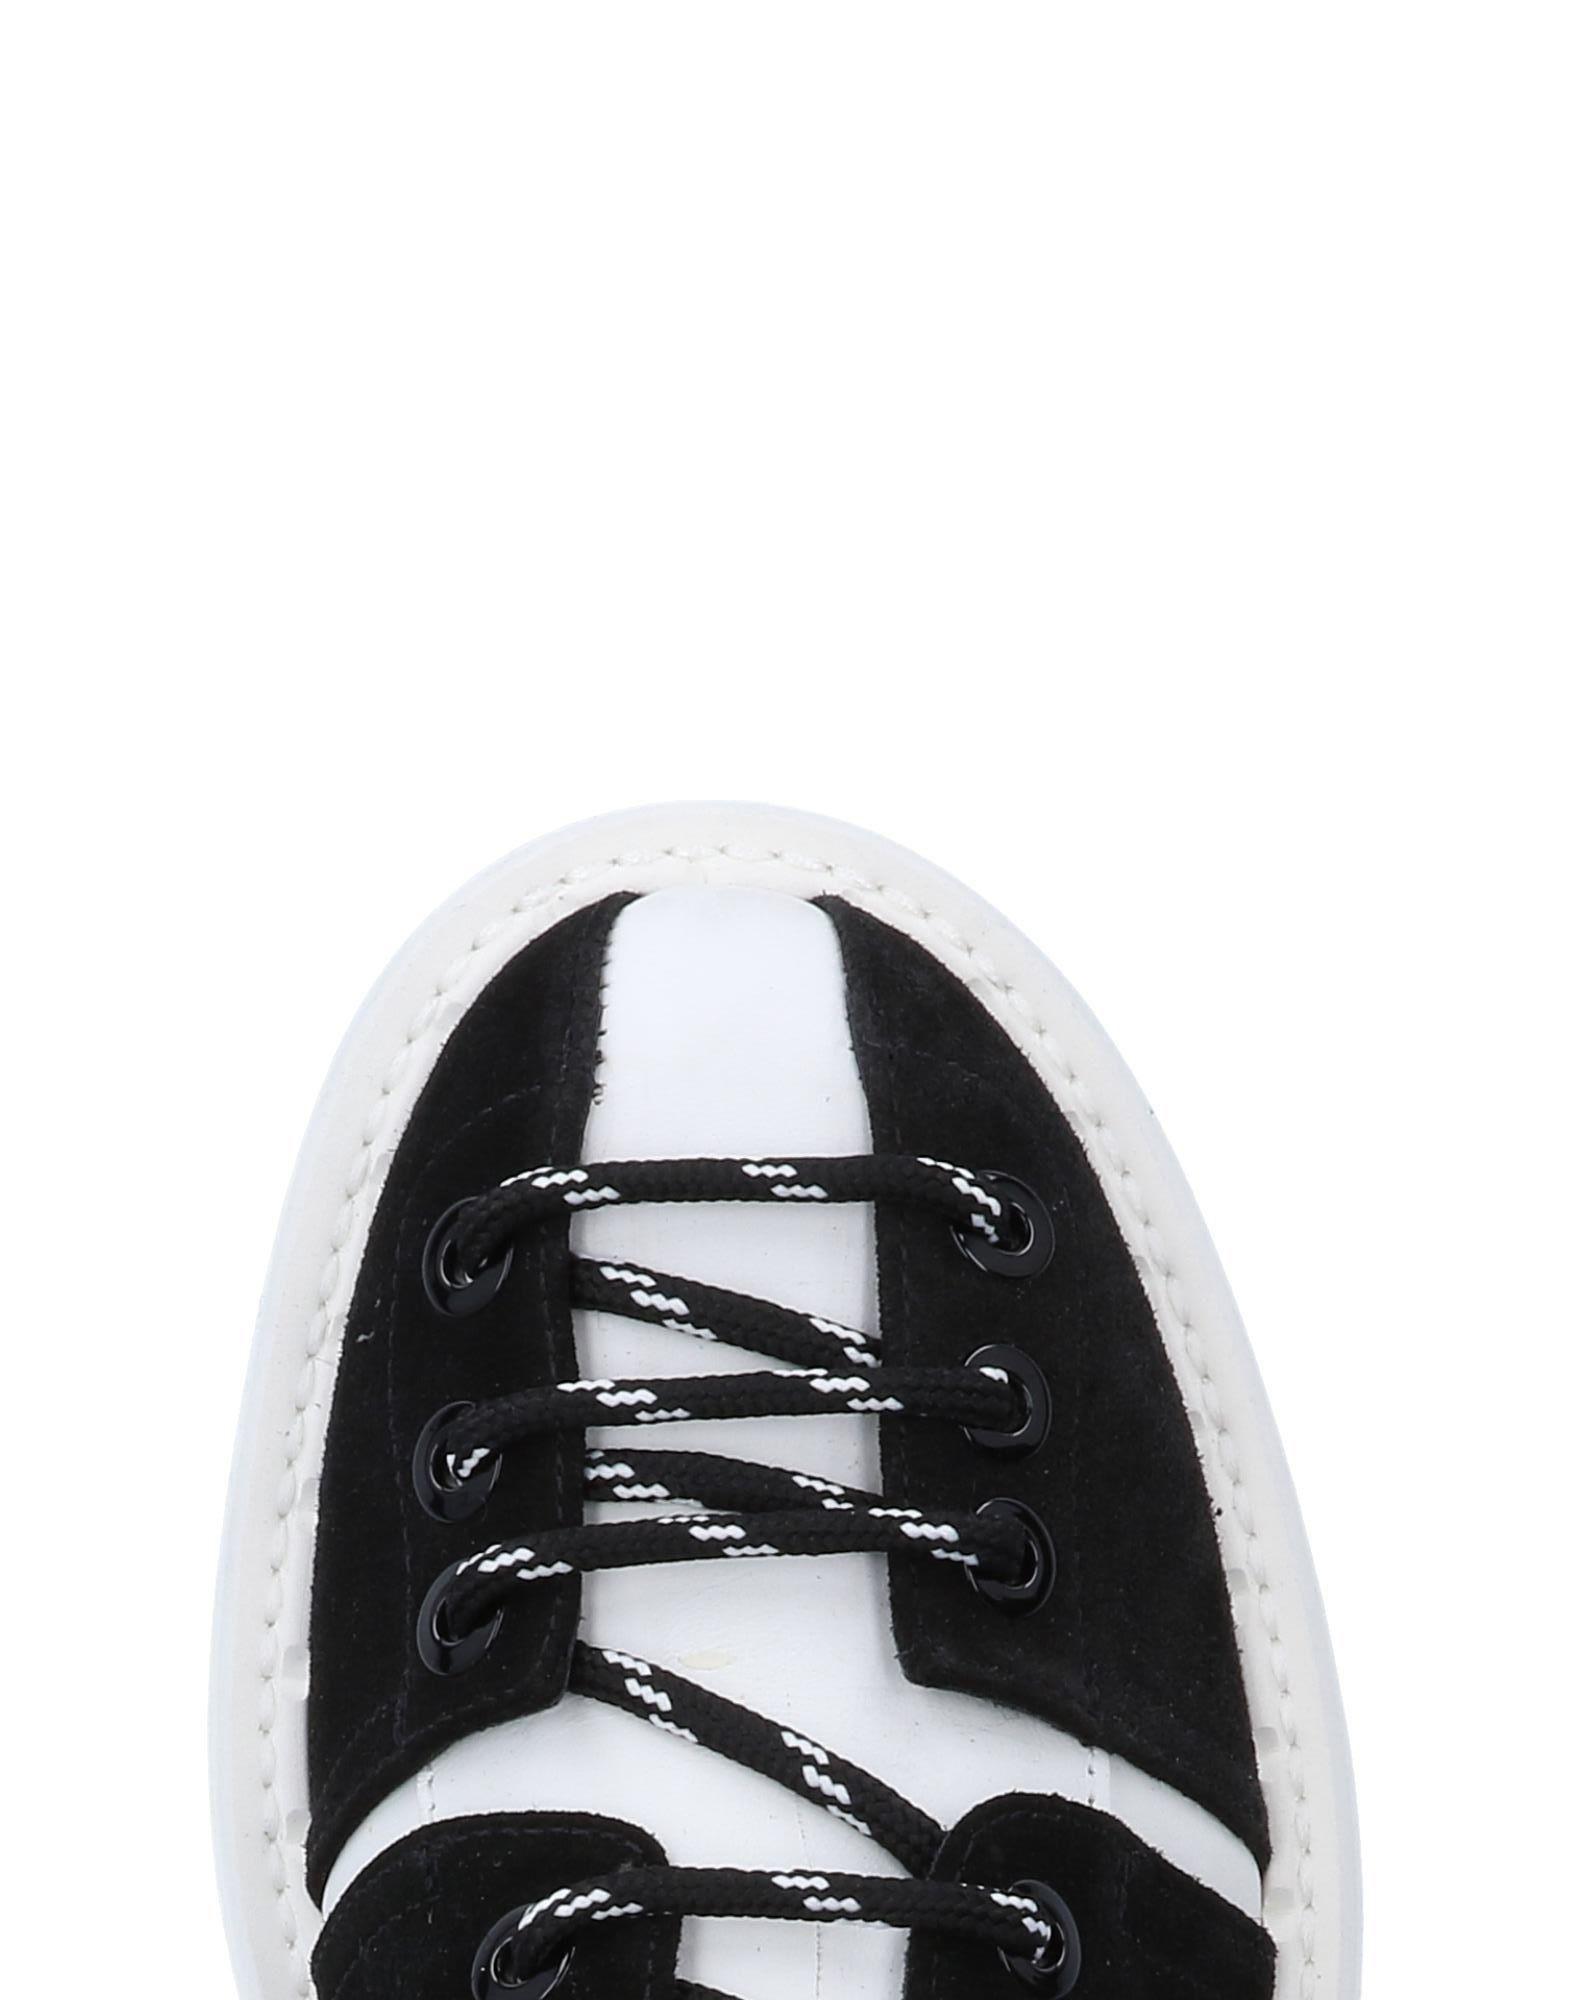 Bruno Bordese Sneakers Sneakers Sneakers - Men Bruno Bordese Sneakers online on  Australia - 11496731AG e9ad81